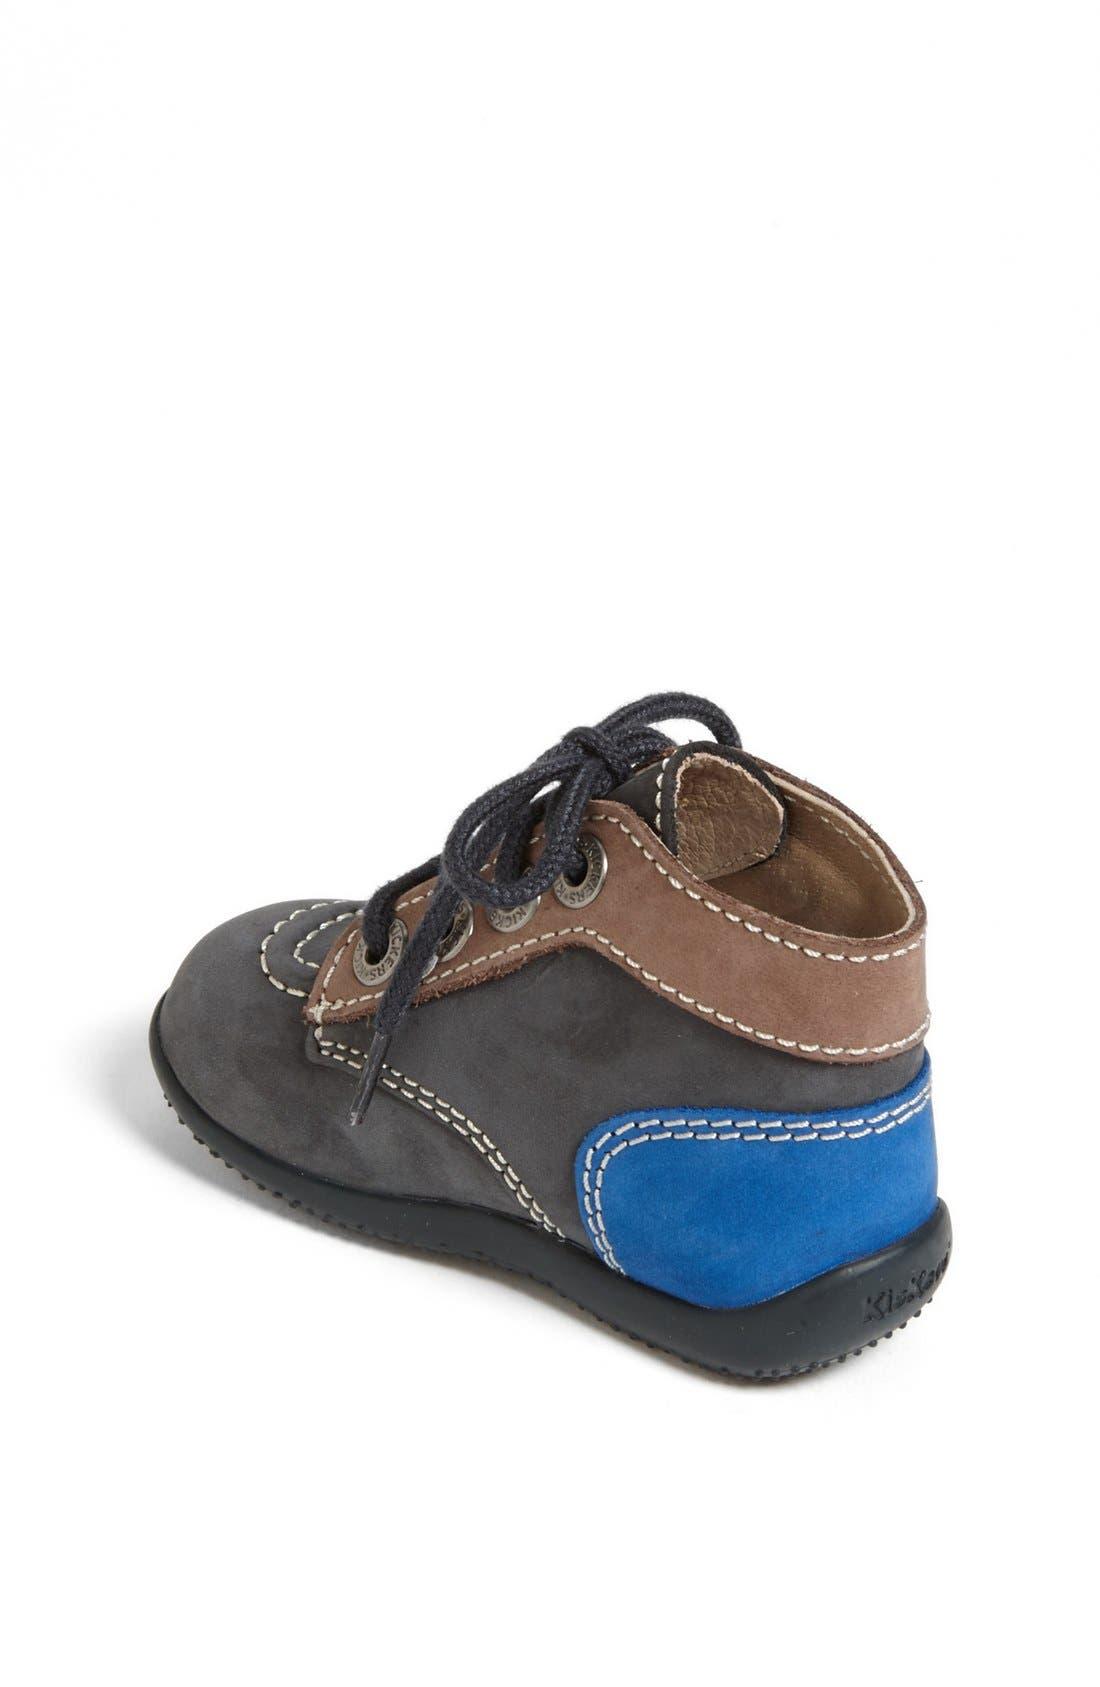 Alternate Image 2  - Kickers 'Bonbon 82' Boot (Baby, Walker & Toddler)